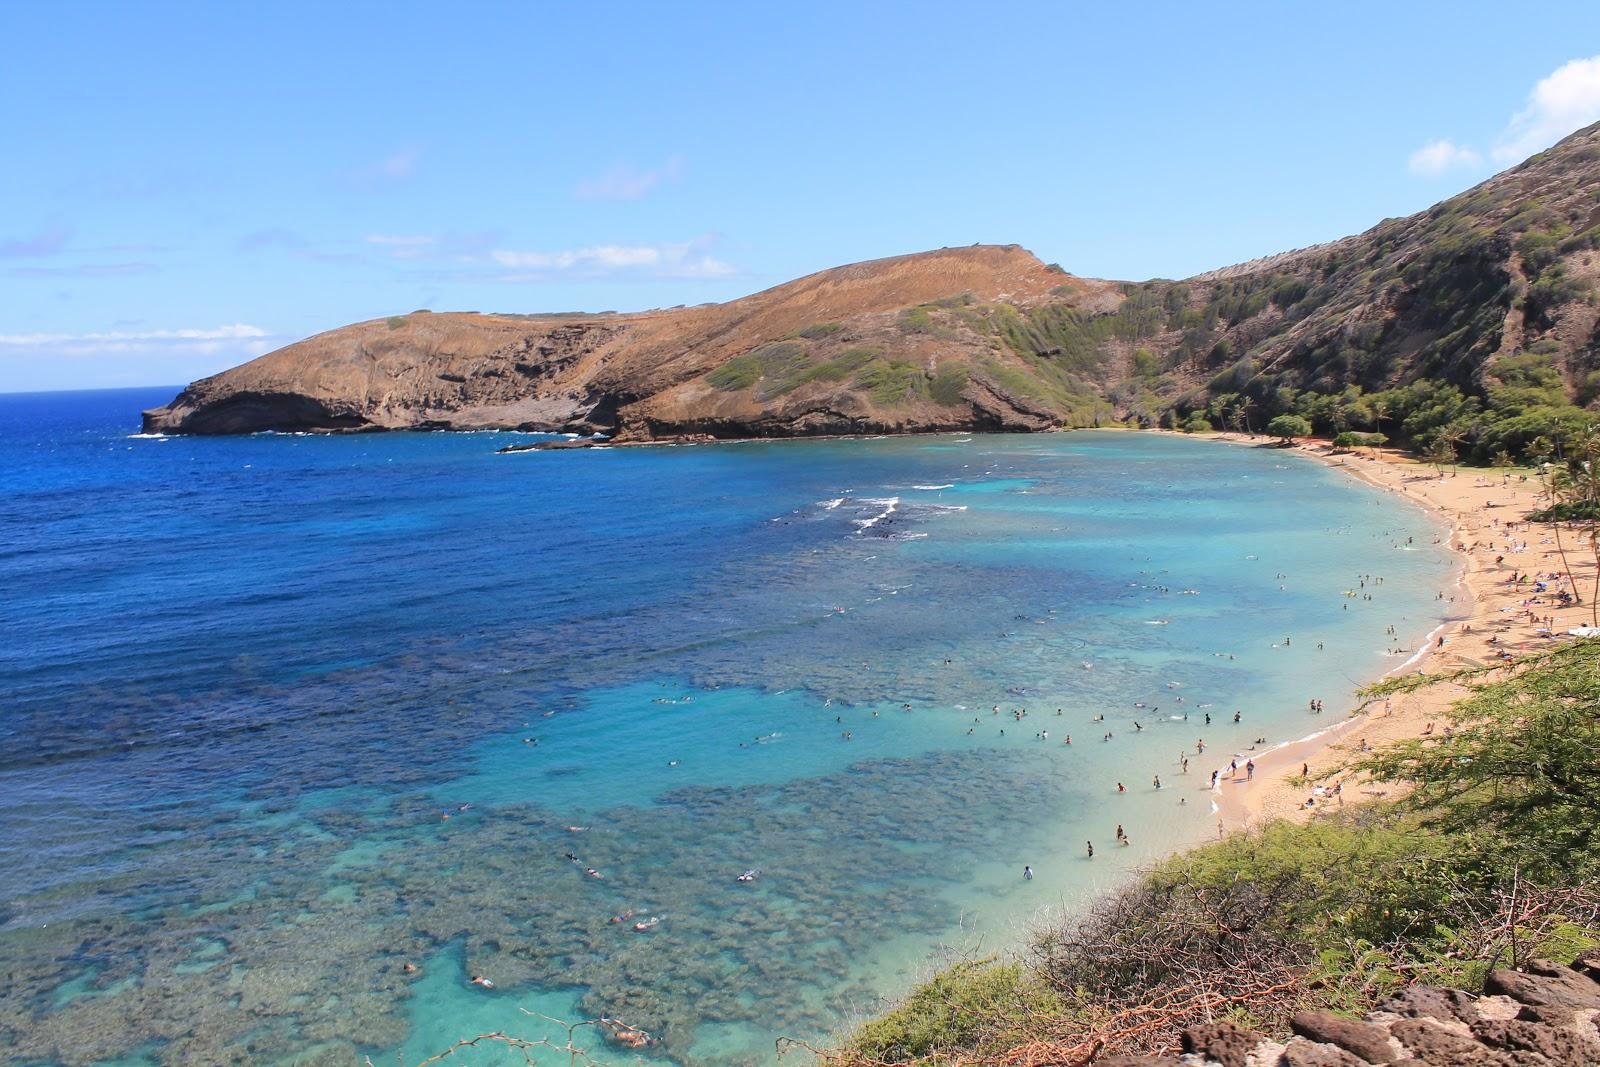 Contea Di Honolulu Hawaii i miei viaggi low cost: 2012